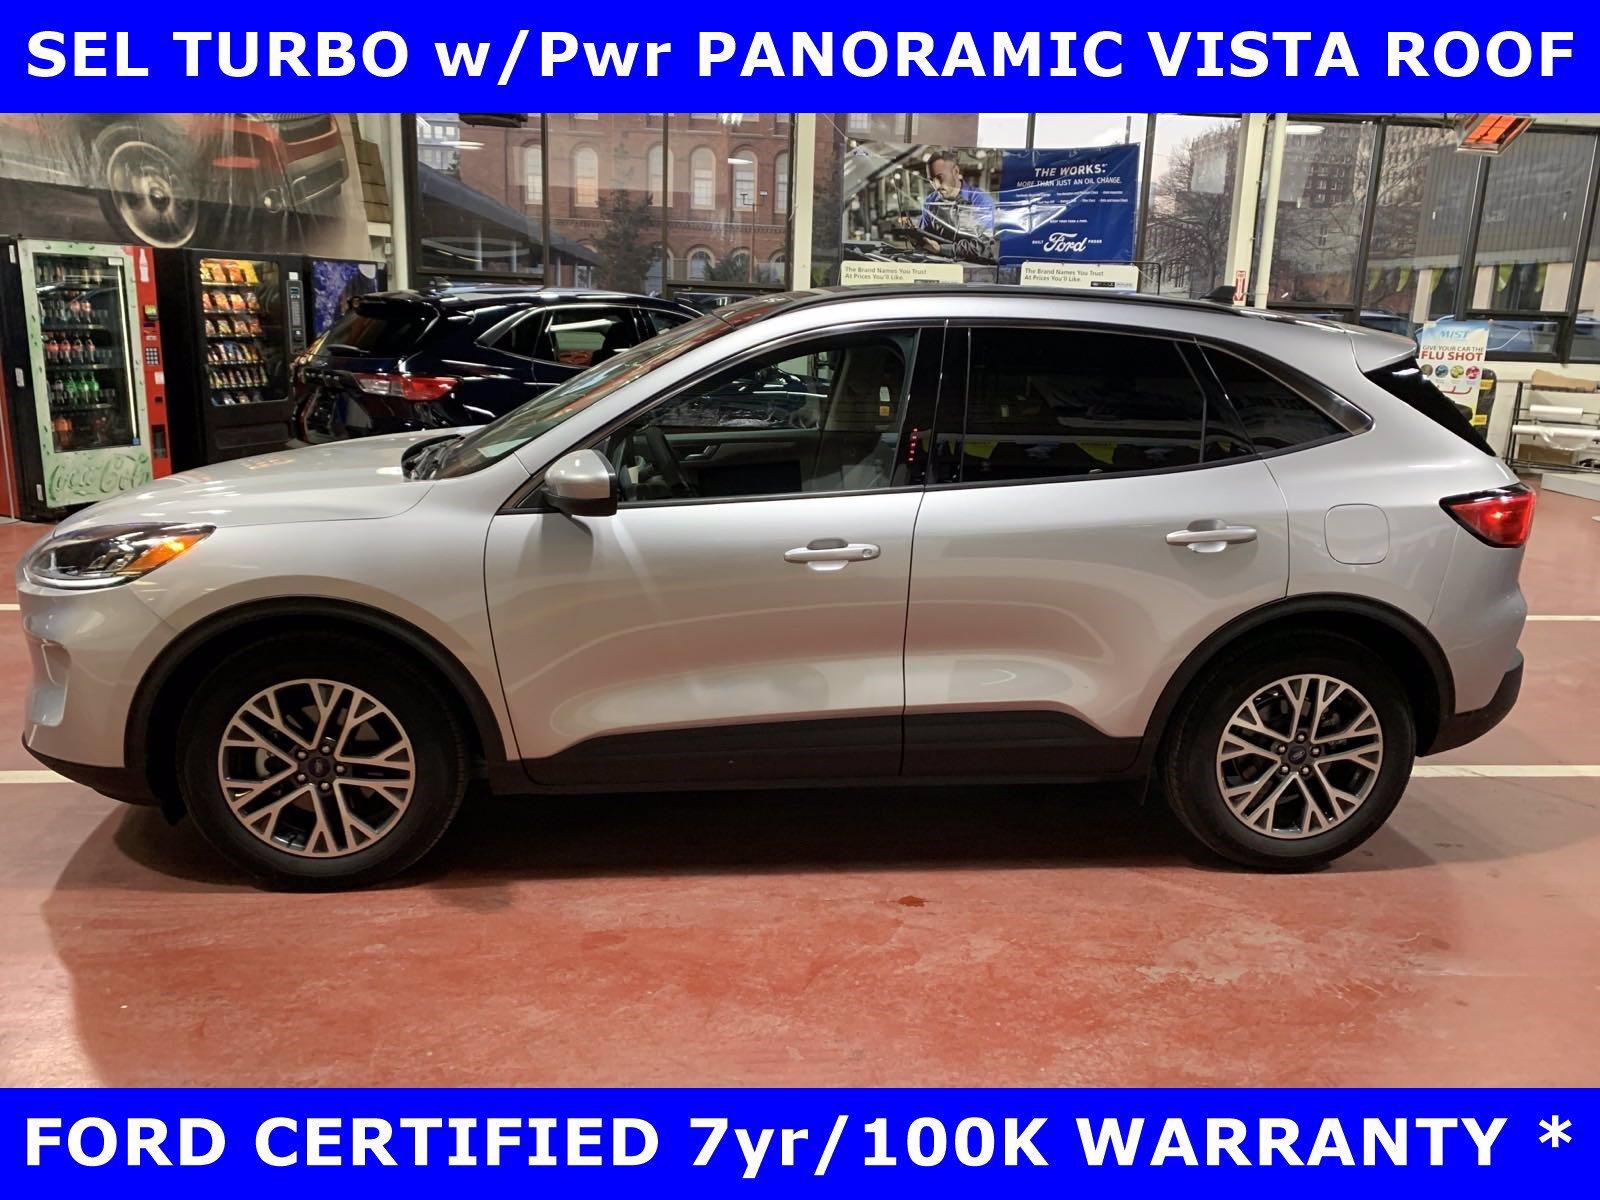 2020 Ford Escape SEL TURBO w/PANORAMIC-Htd SEATS-18in SPORT ALLOYS SUV